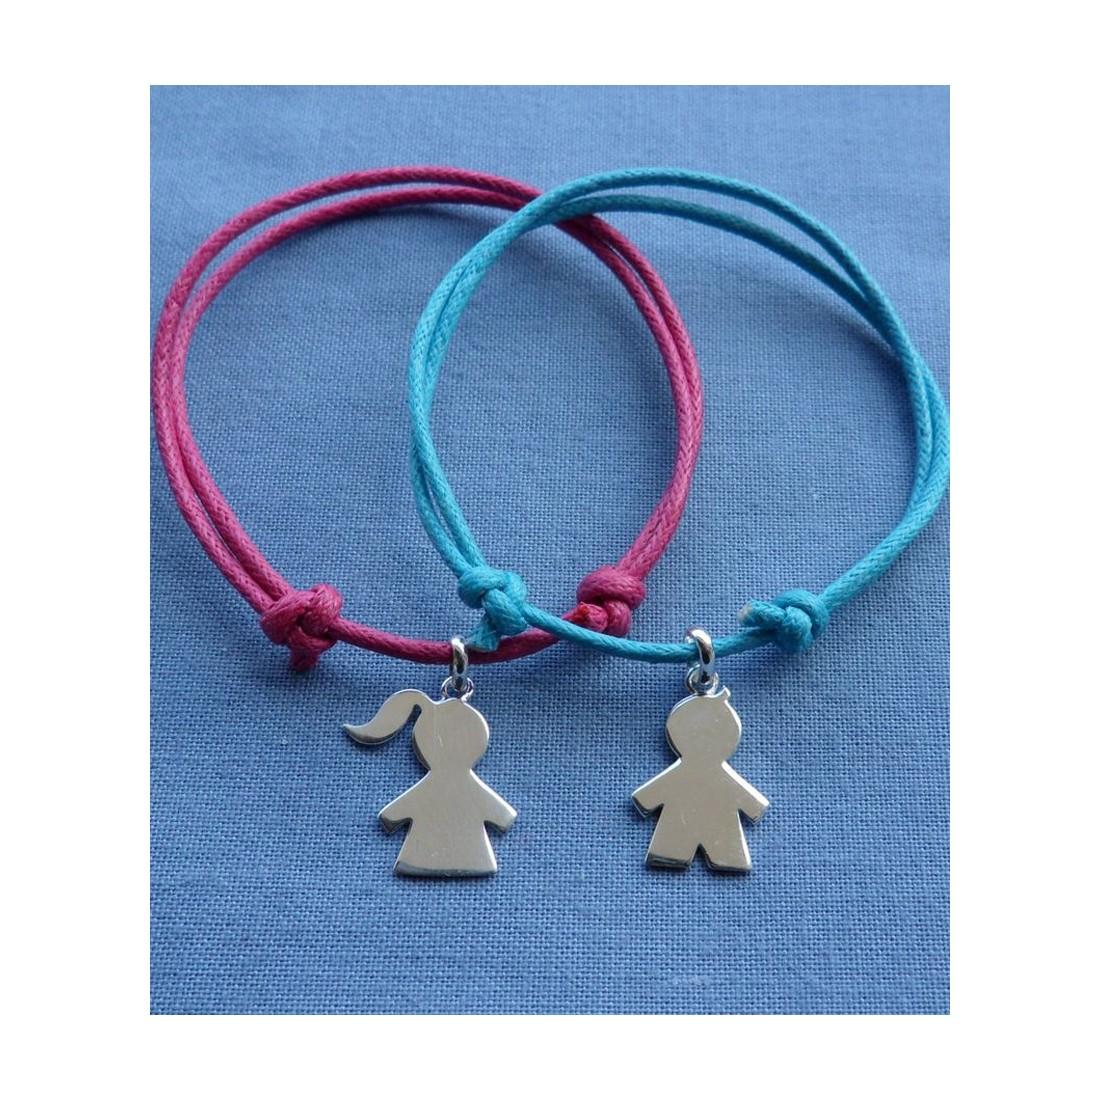 Bracelet cordon à graver bebe fille ou garçon - Mixte